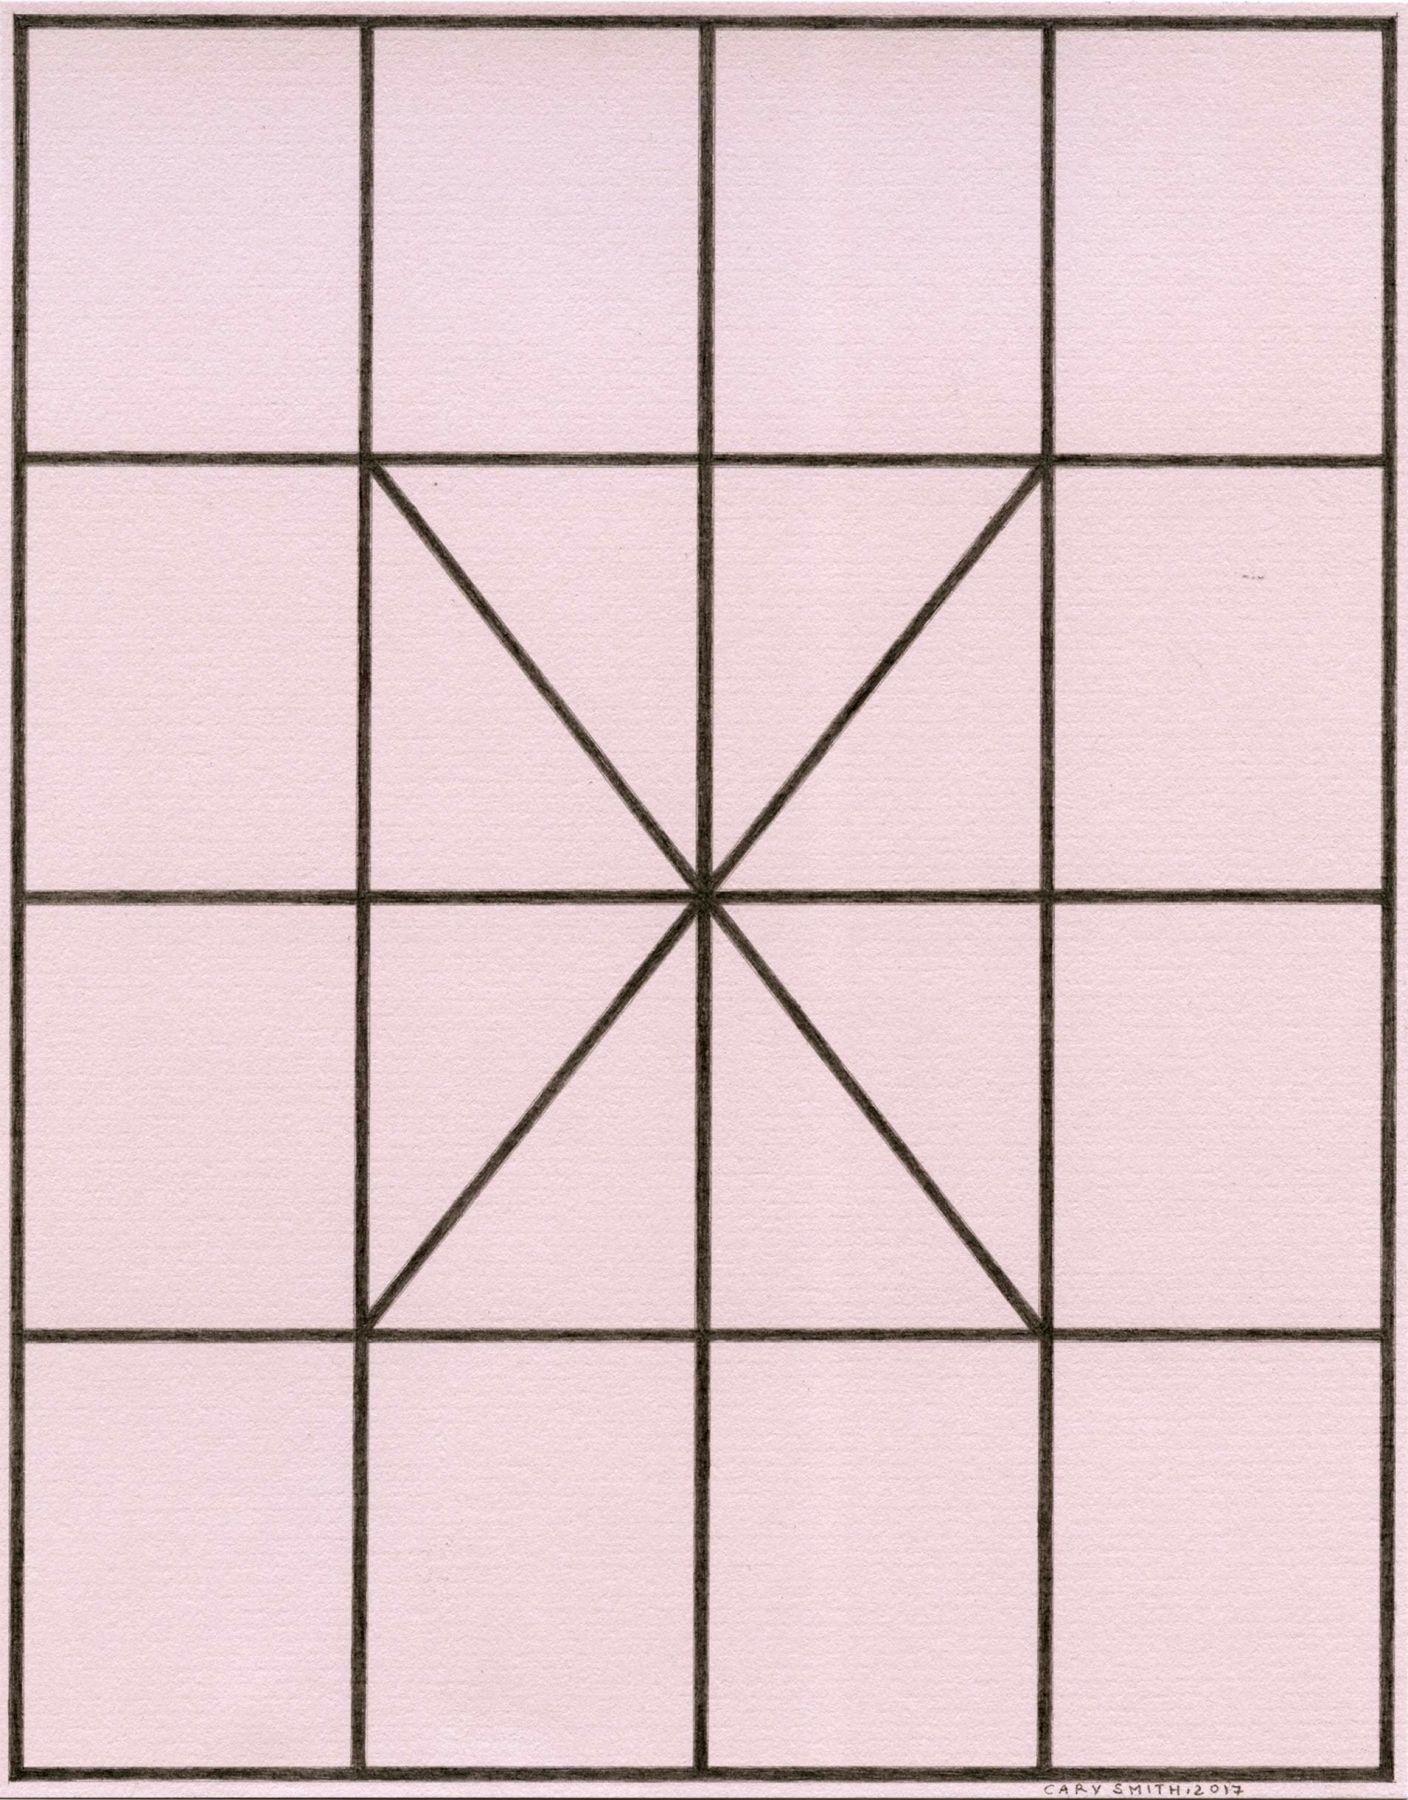 Cary Smith Complex Diagonals #4, 2017